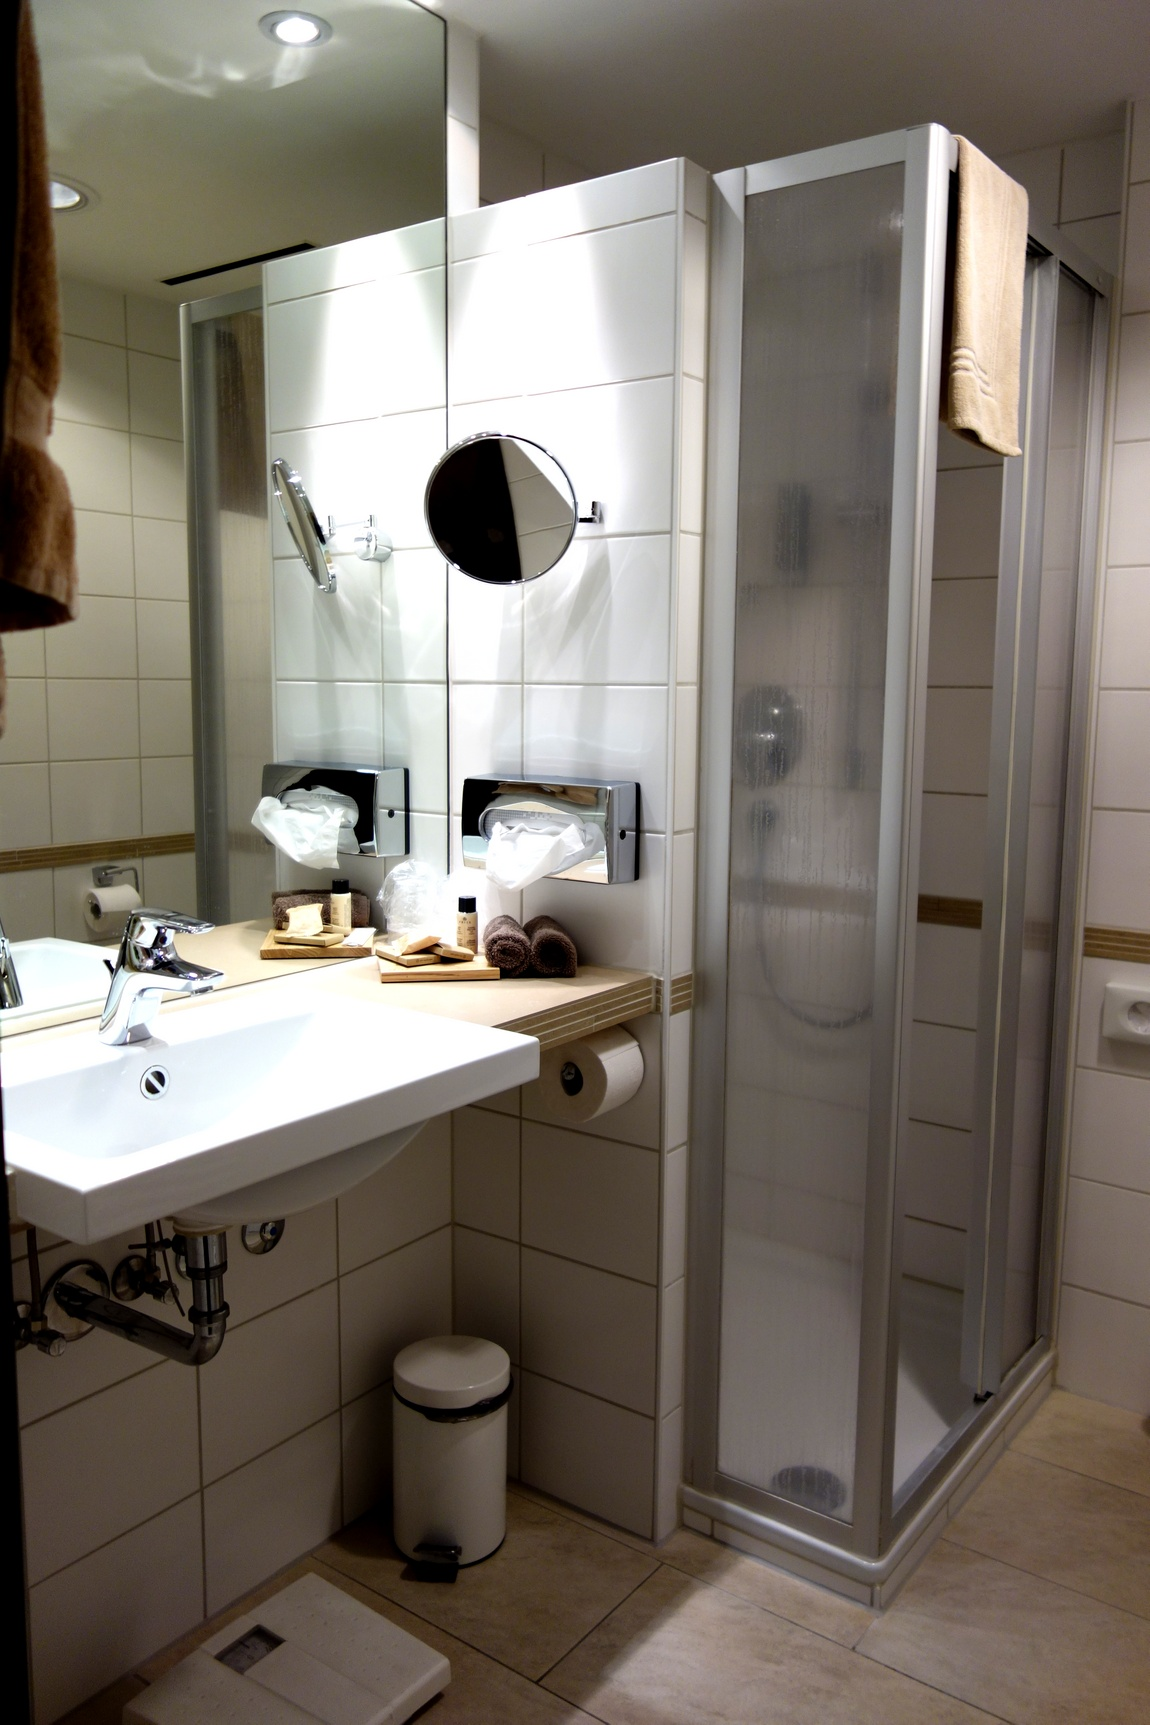 Ванная комната в гостинице Мемминген - Германия